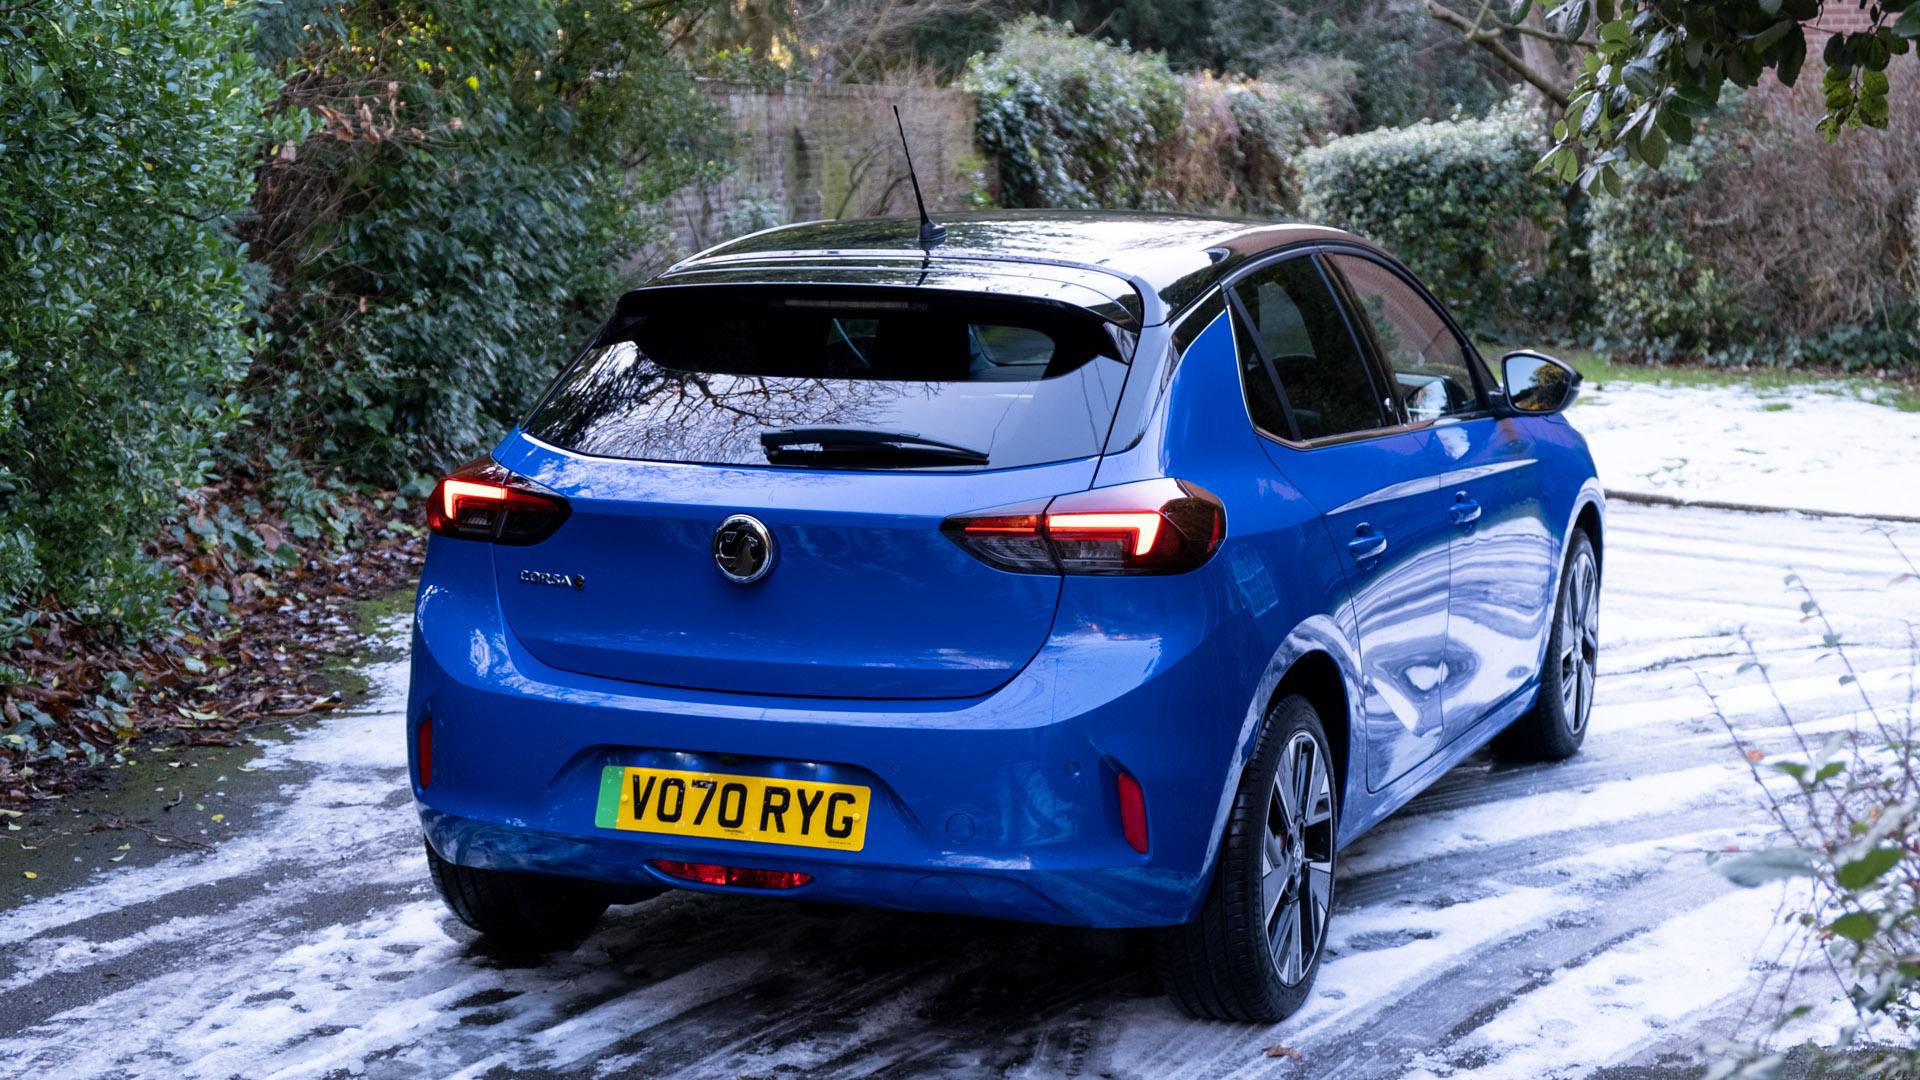 Vauxhall Corsa-e review (2021): An electrified classic ...